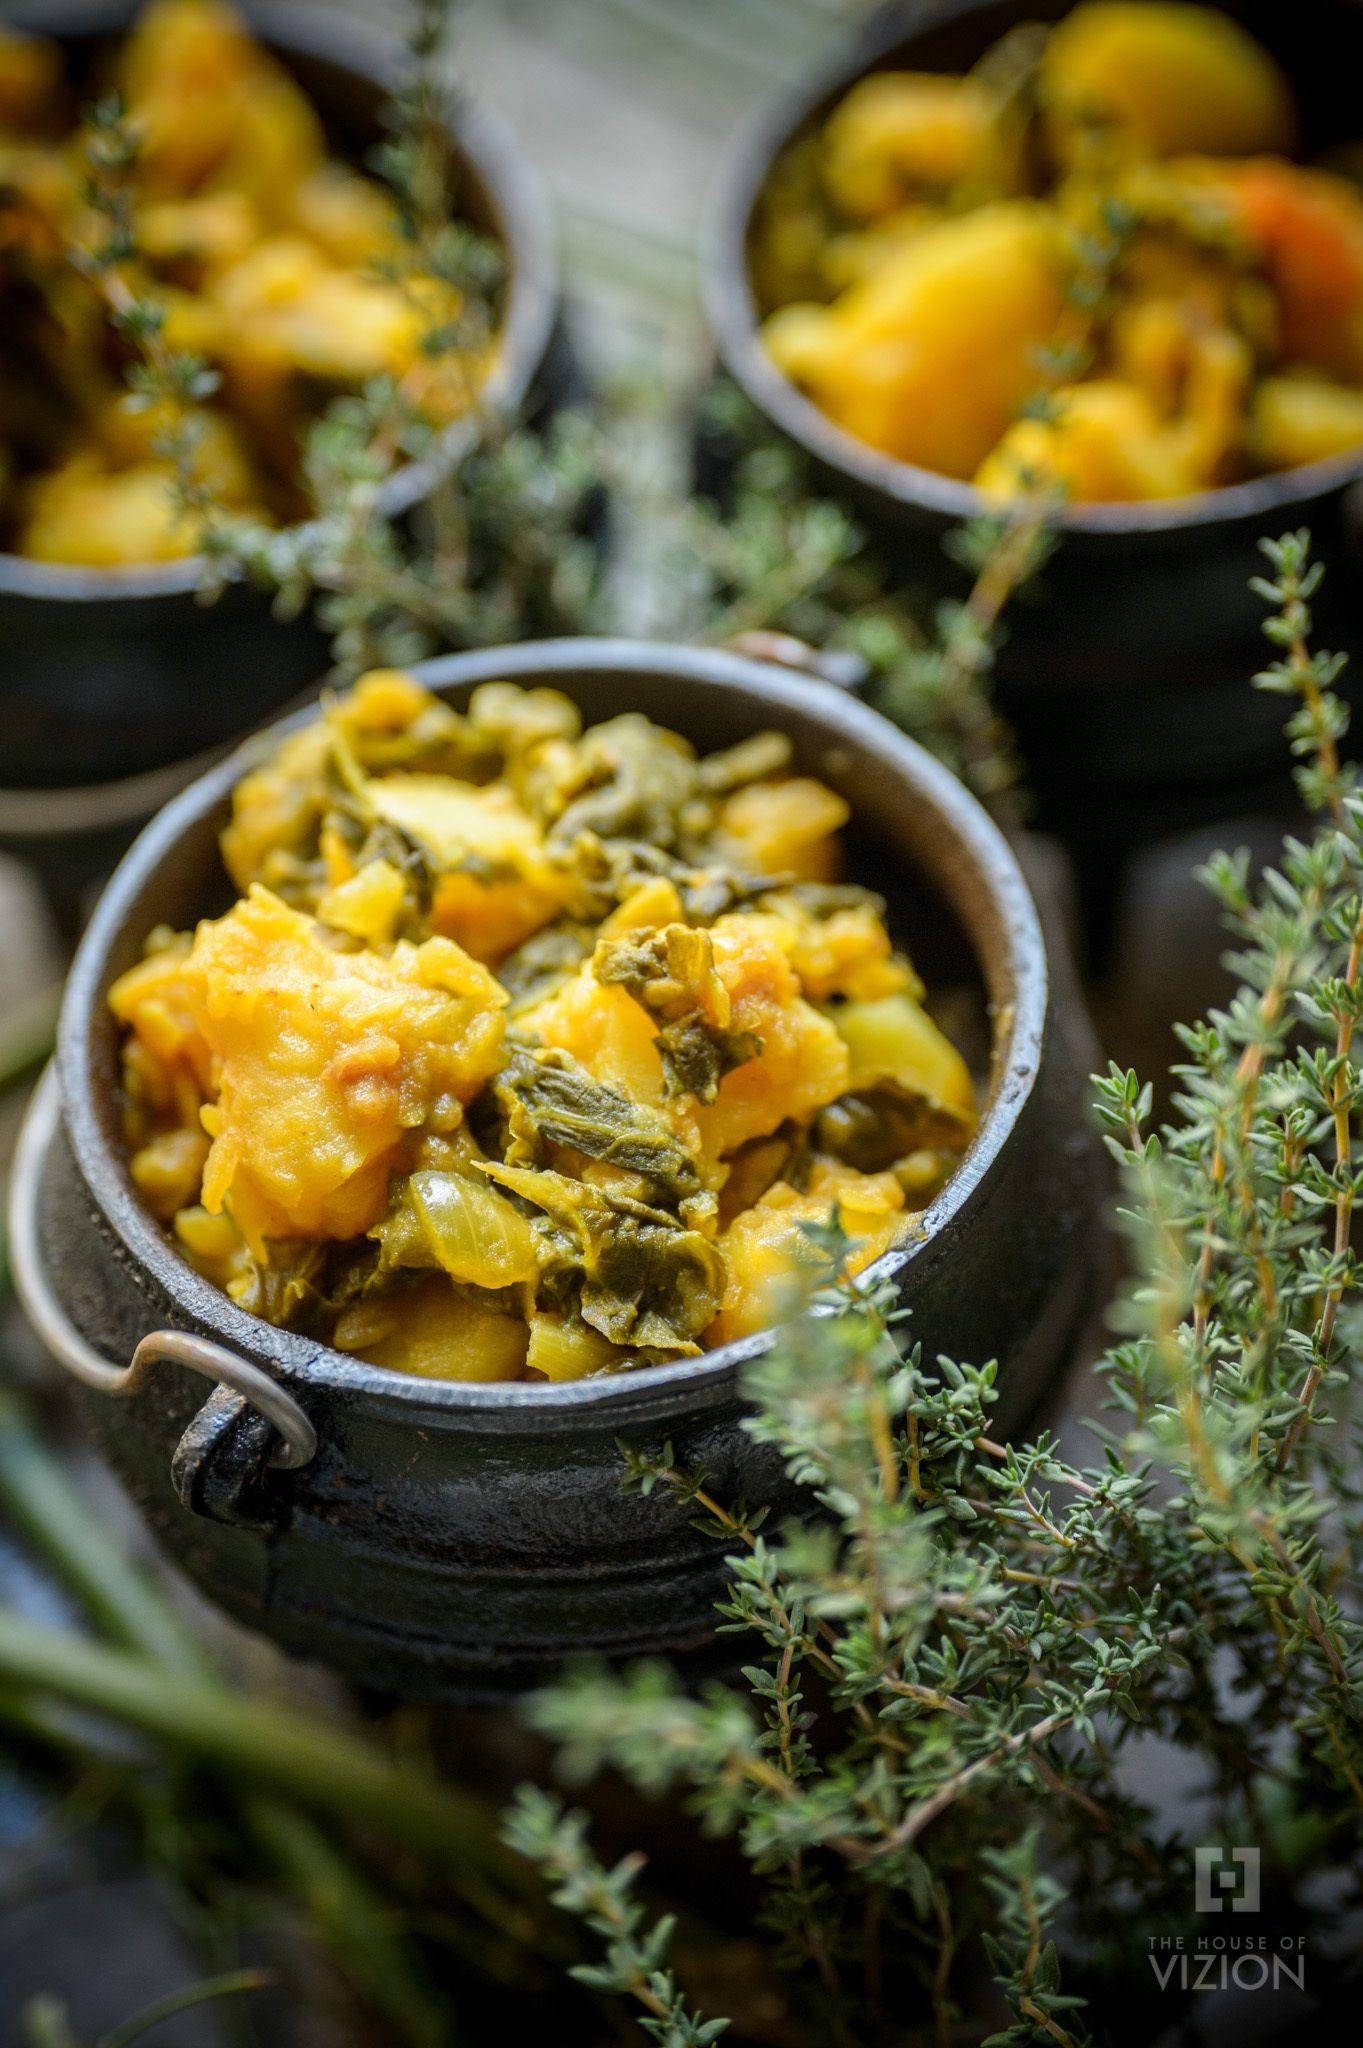 #greenmondaysa: Spinach And Potato Hotpot photo